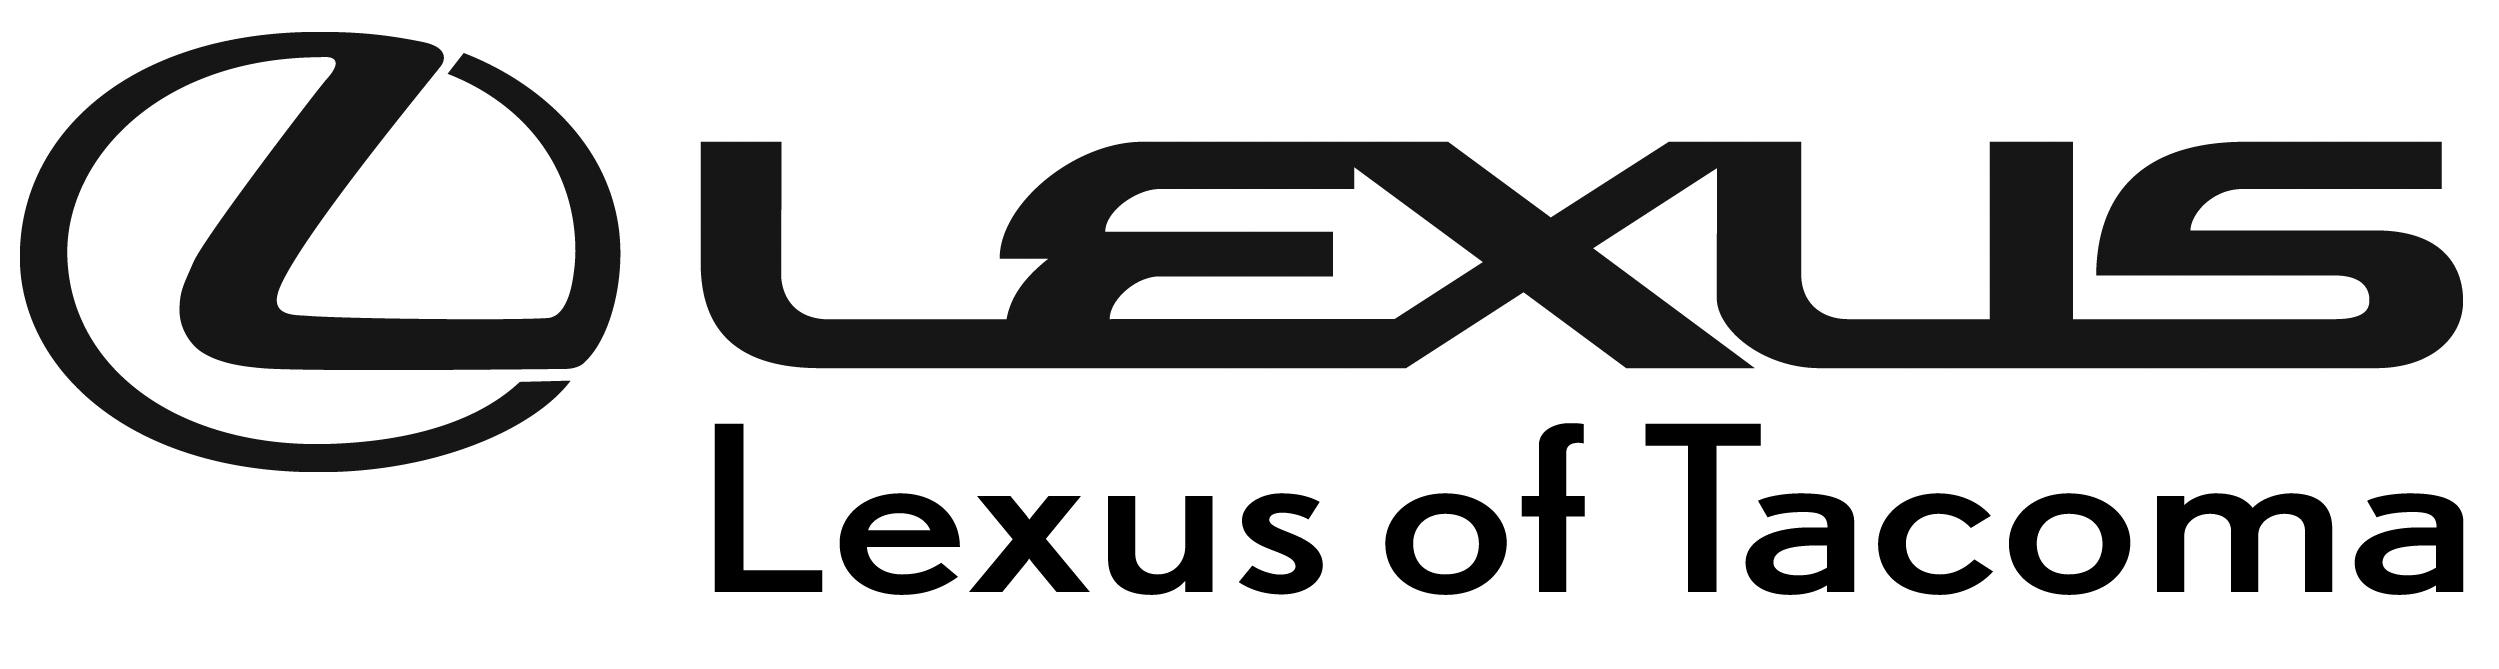 Logo for Lexus of Tacoma